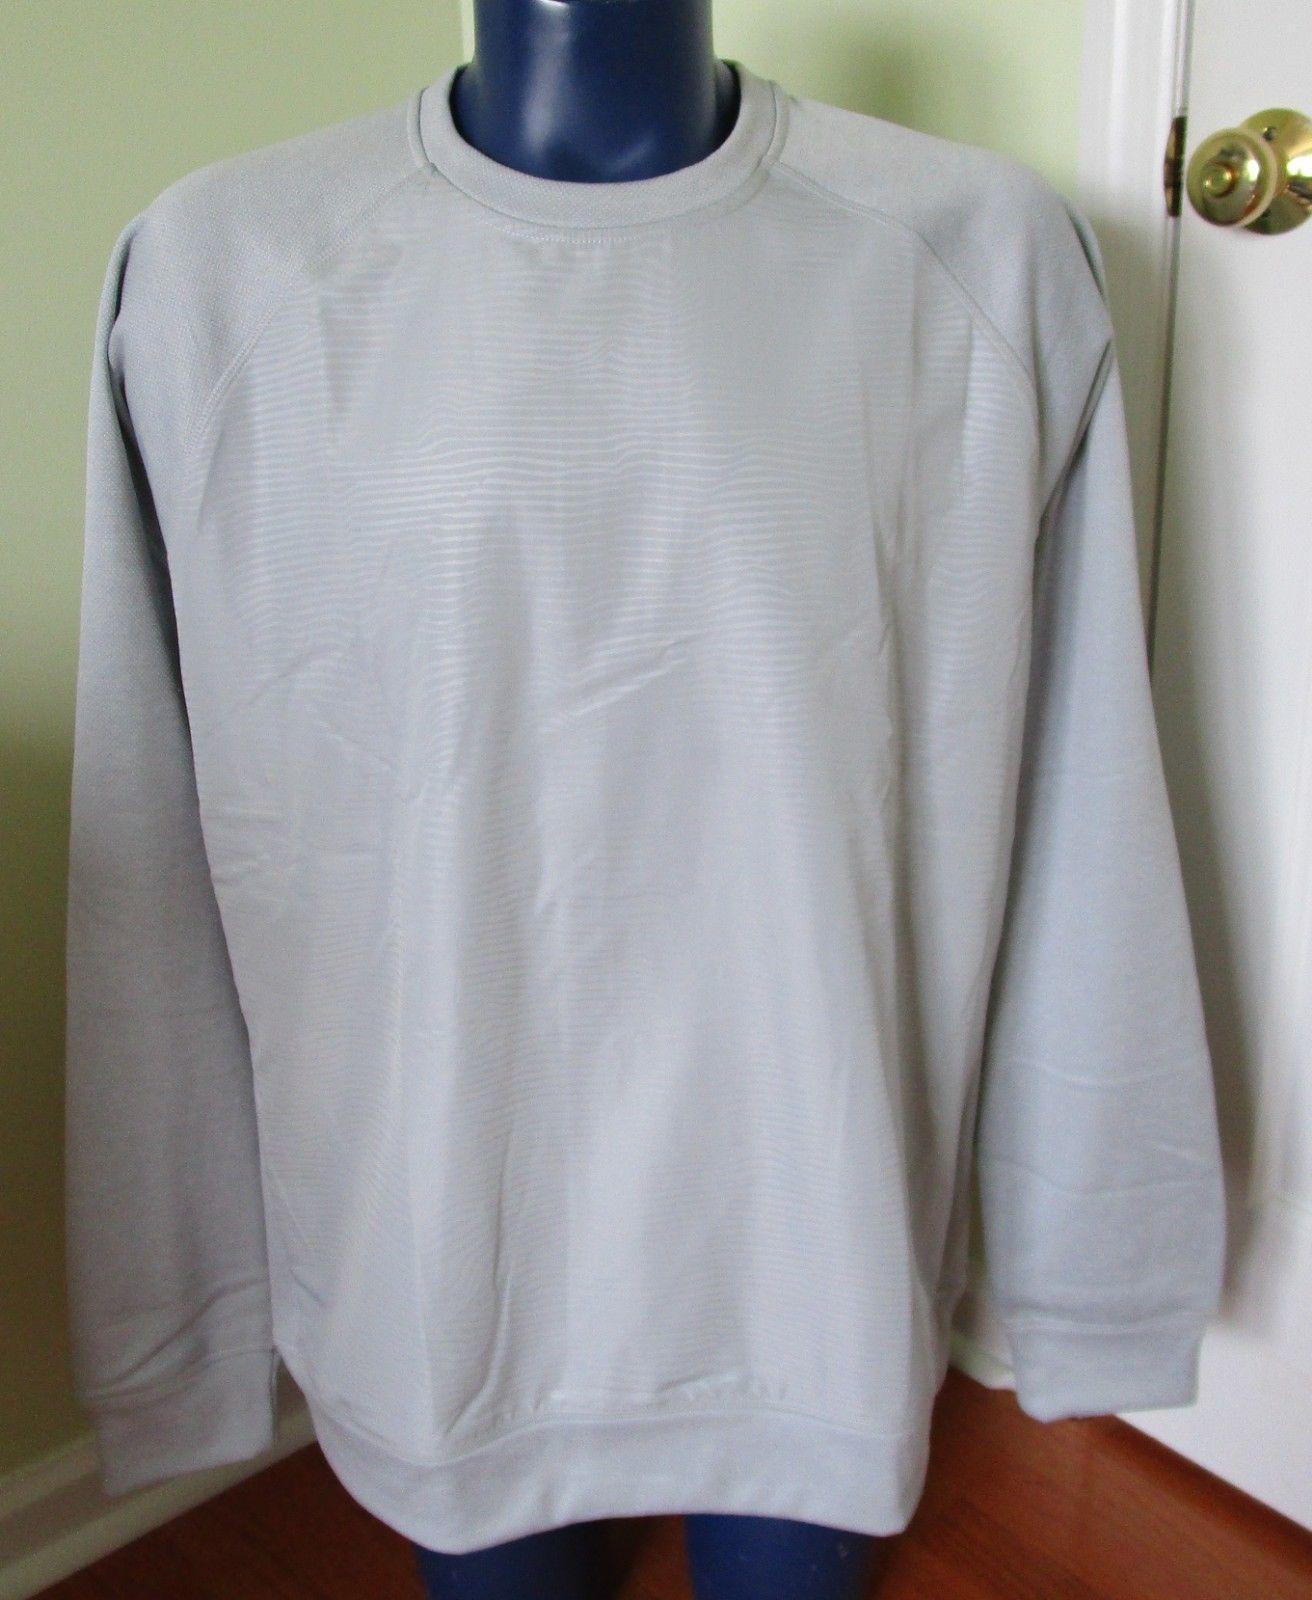 John Wall NBA Adidas Wavy crew shirt light gray XLT $75 NWT NEW pullover TALL